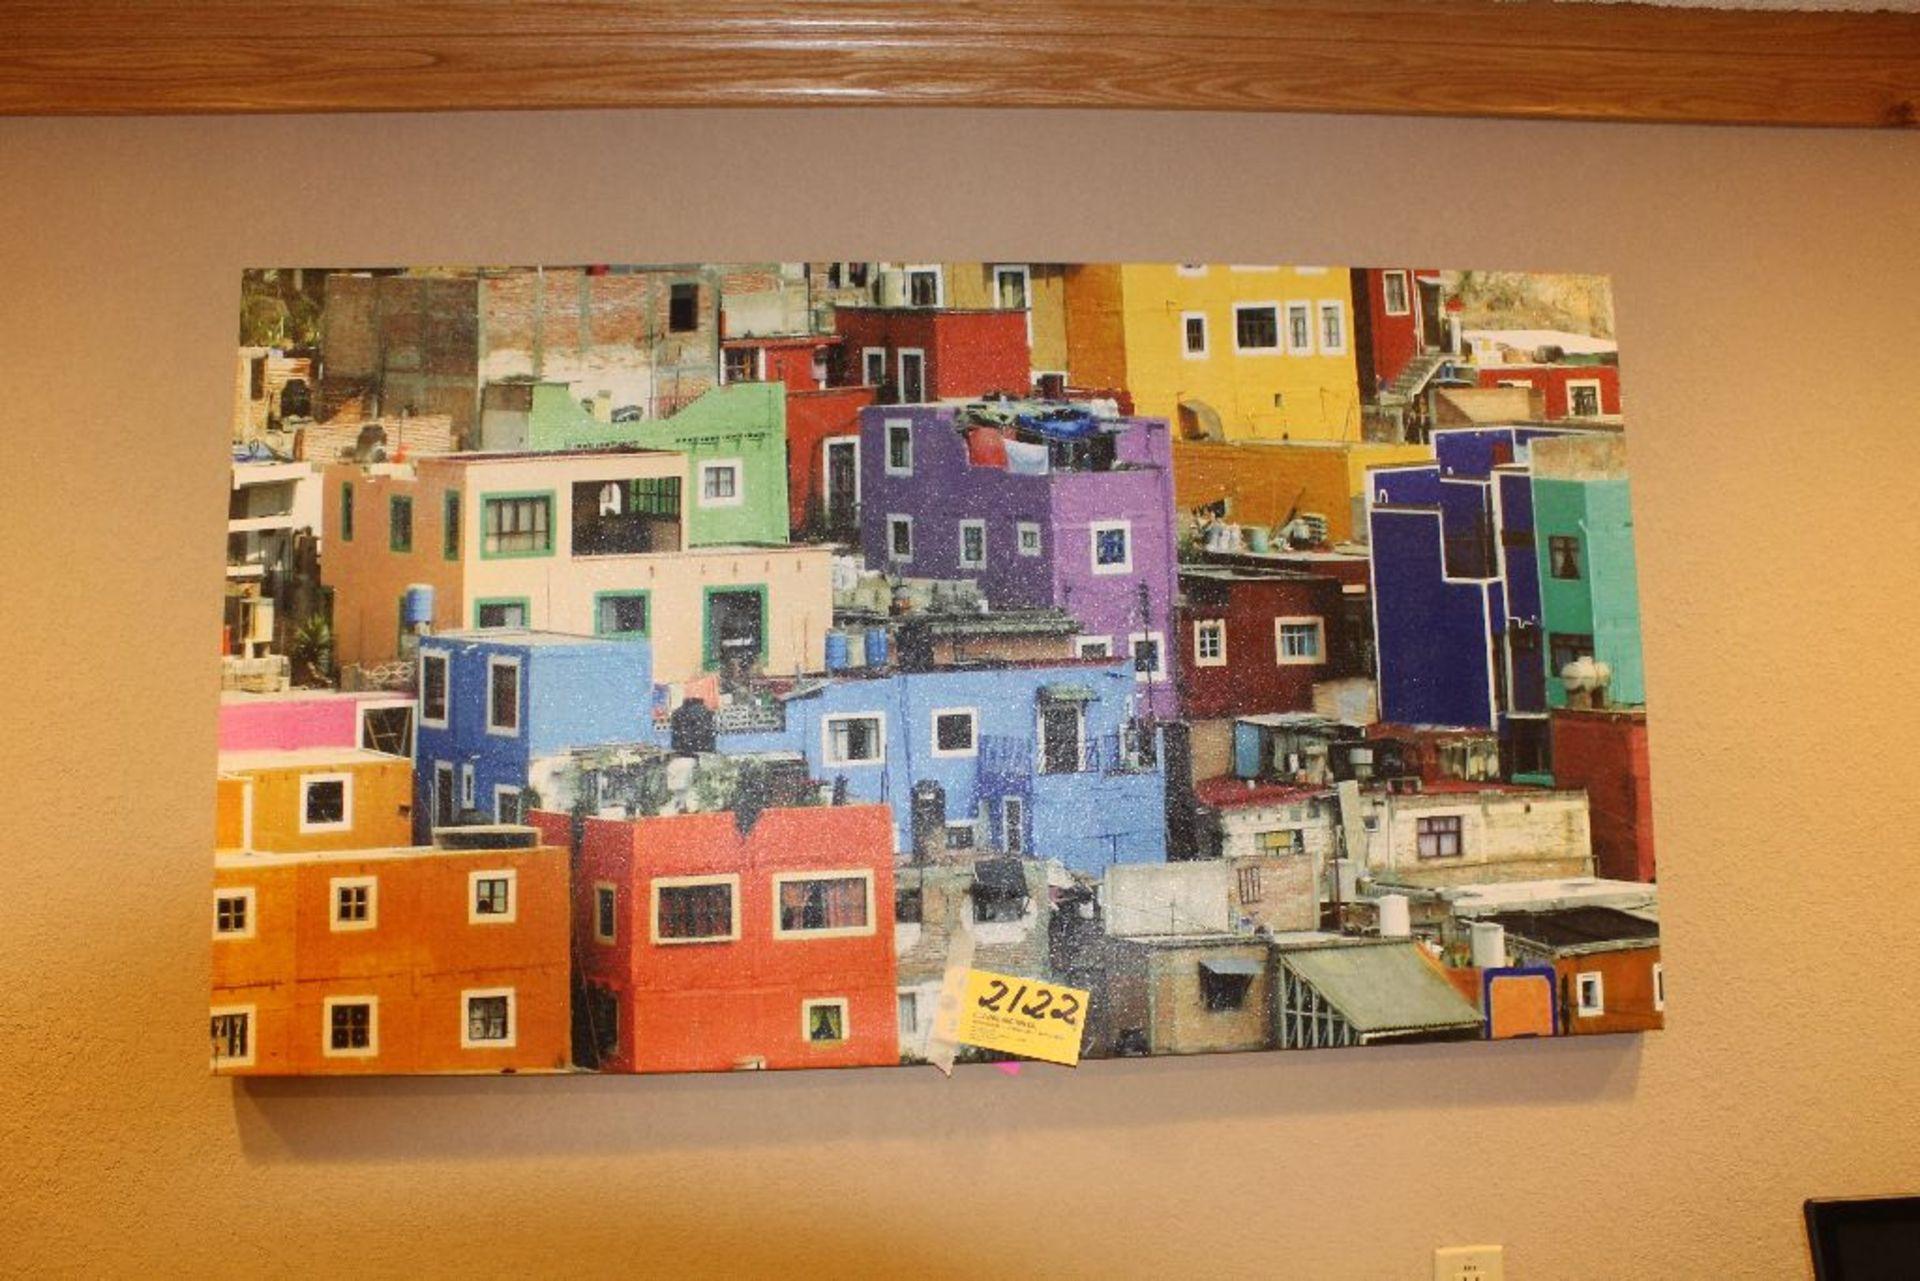 "Lot 2122 - Apartment picture, 54"" x 30""."